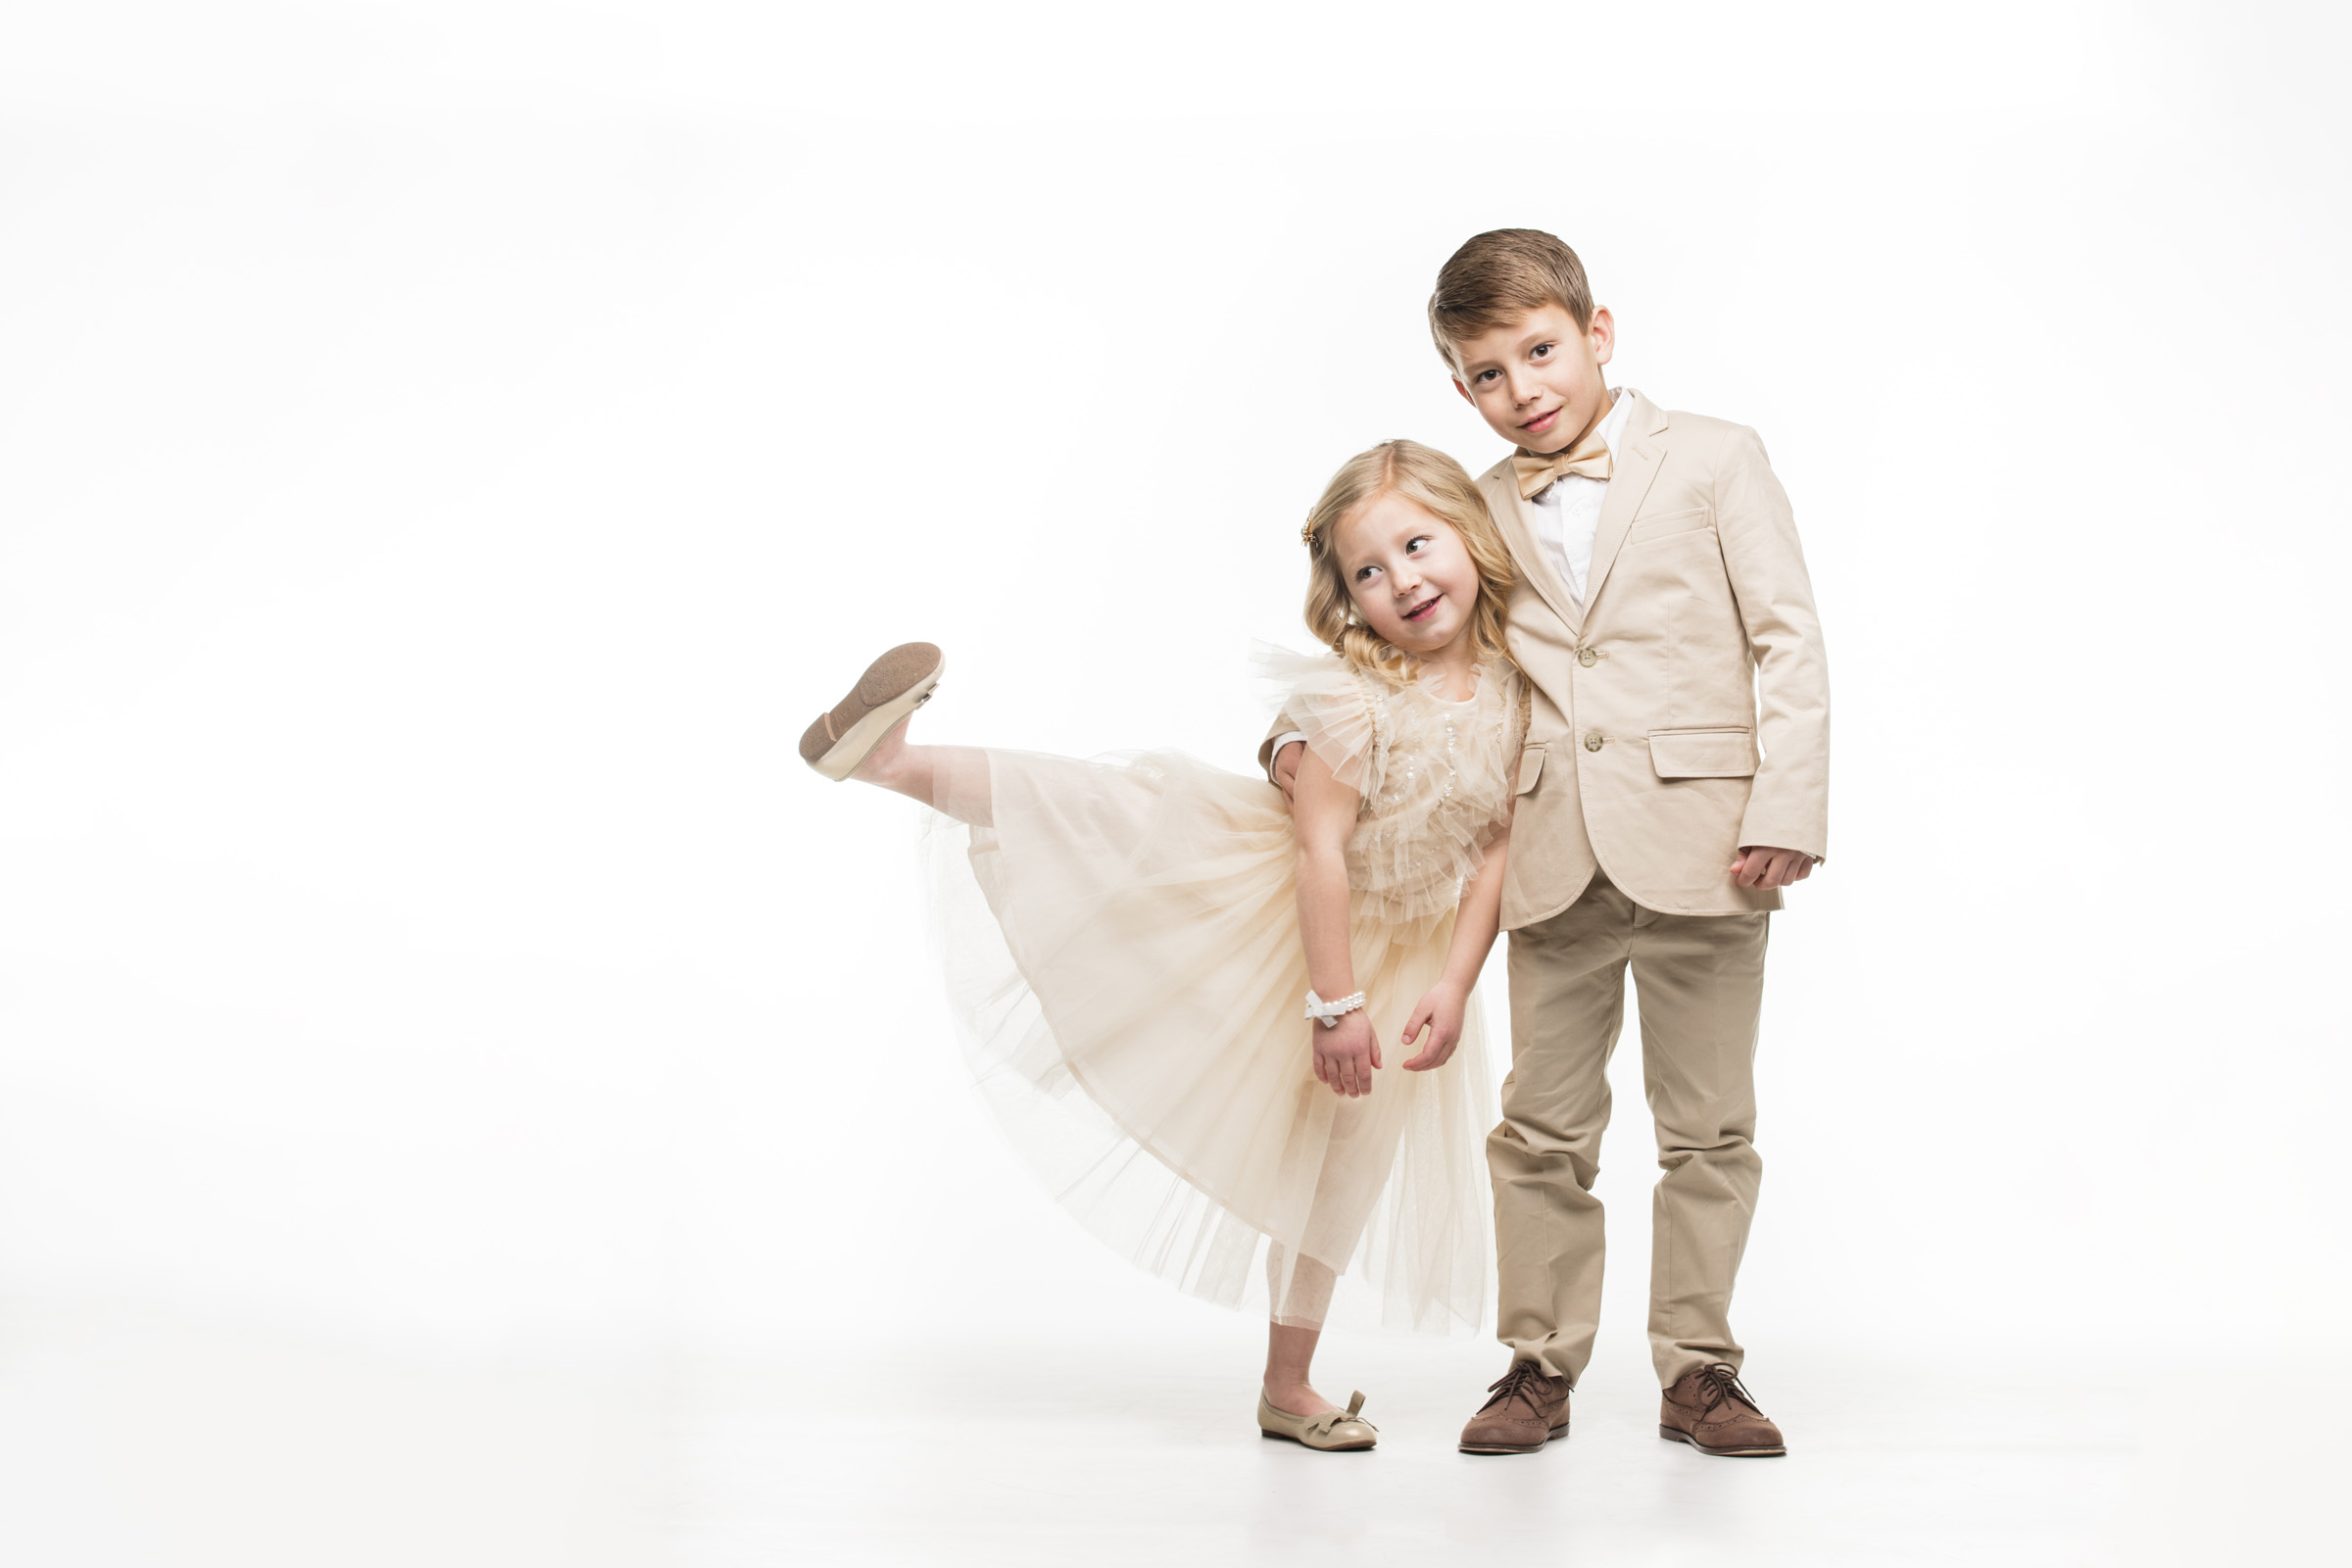 portrait children on white